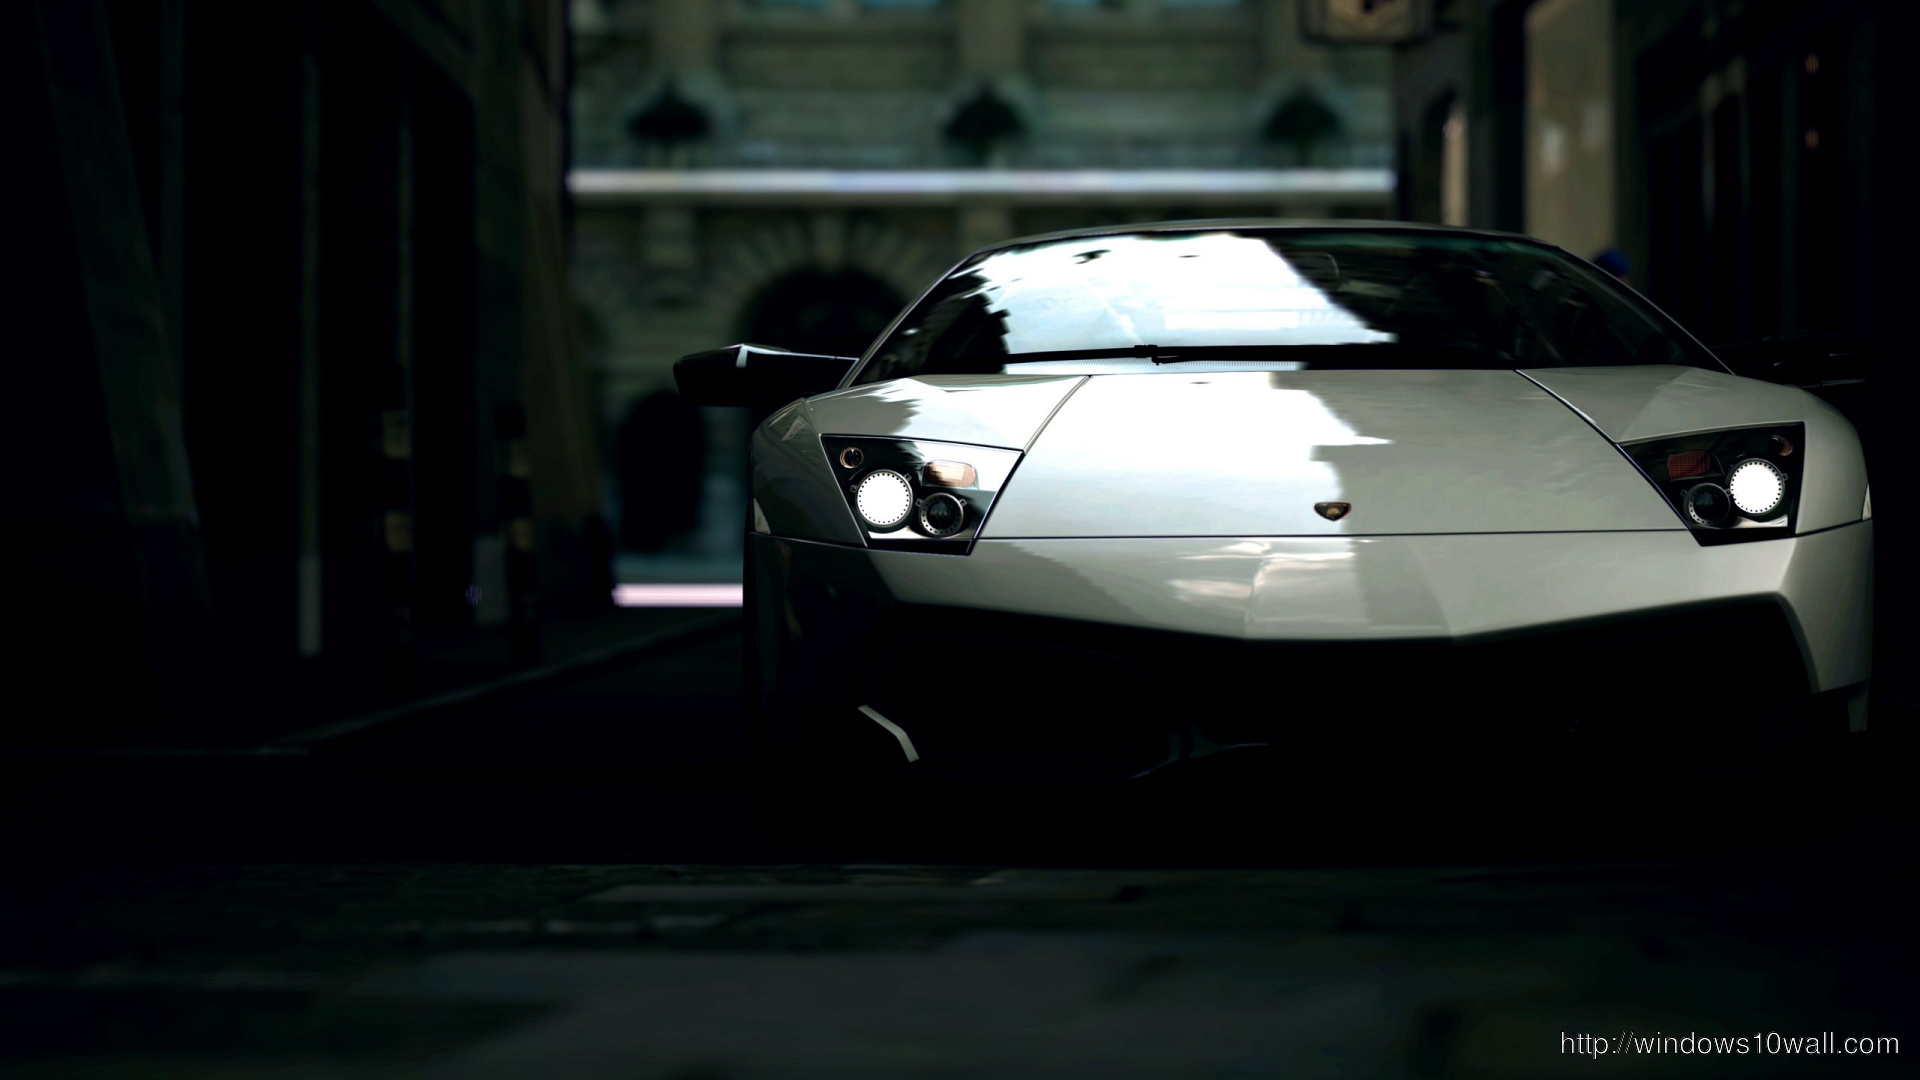 Lamborghini Aventador In the Dark Black 2013 Desktop Background Wallpaper